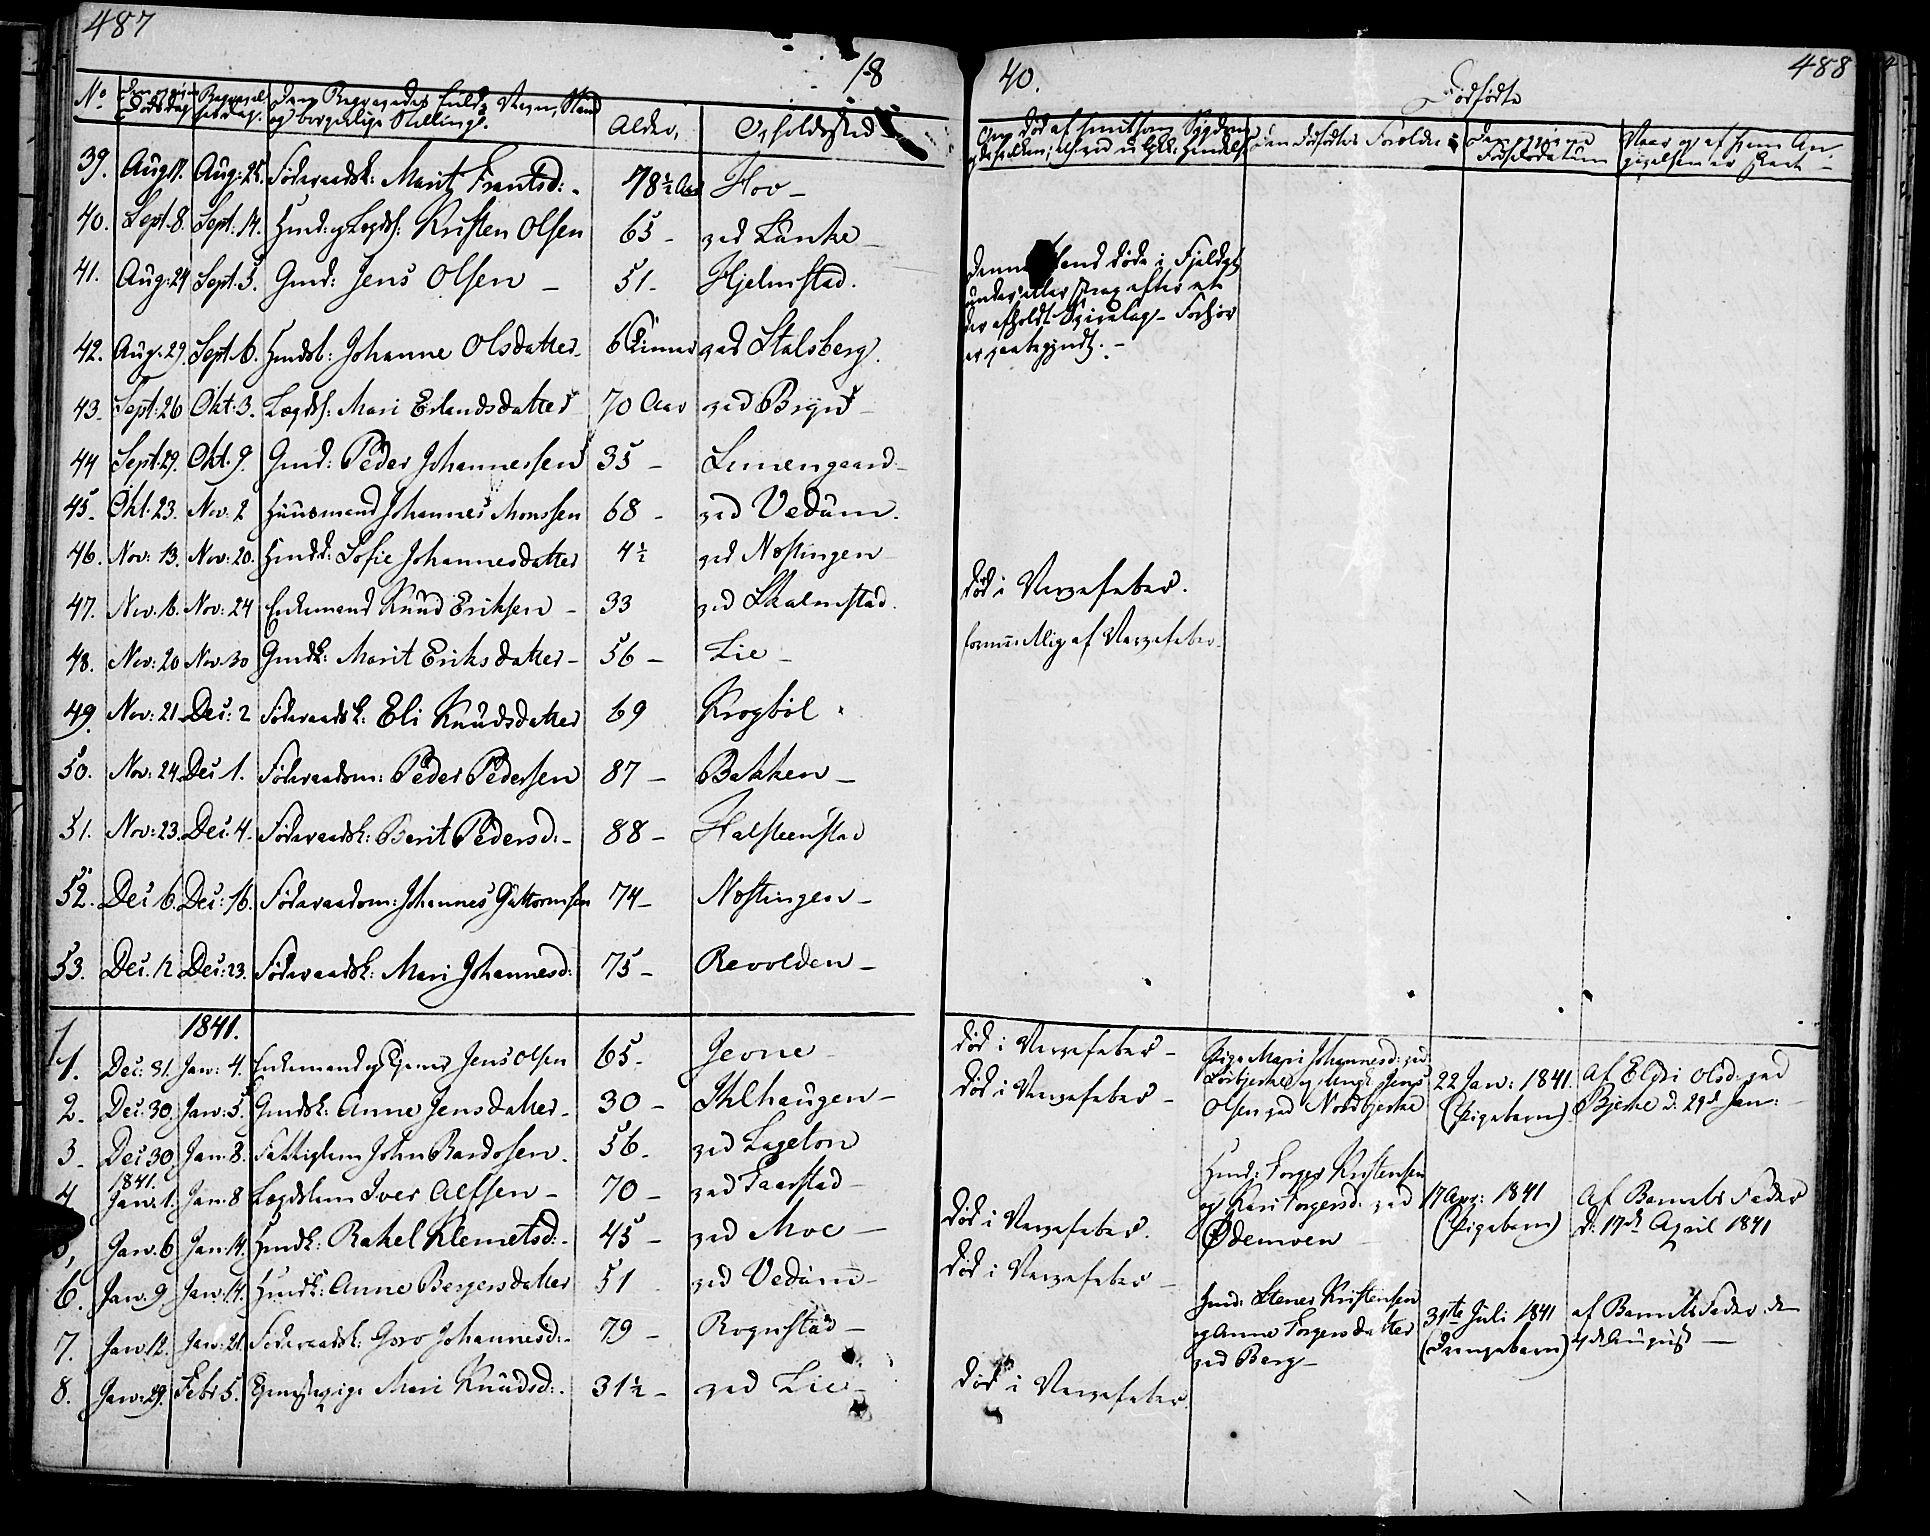 SAH, Øyer prestekontor, Ministerialbok nr. 4, 1824-1841, s. 487-488